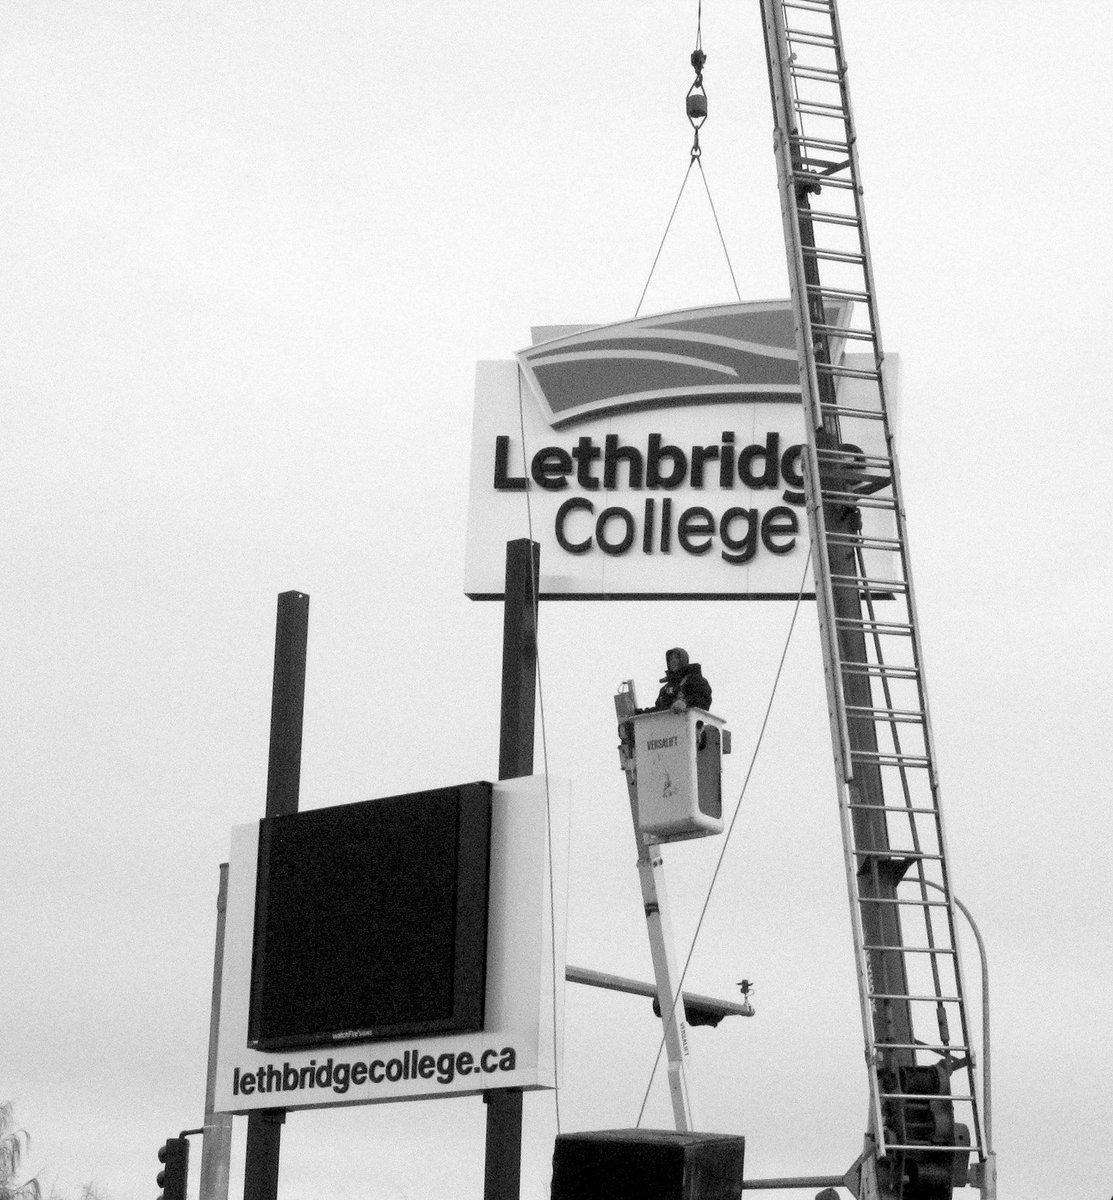 1e529b395 Lethbridge College on Twitter